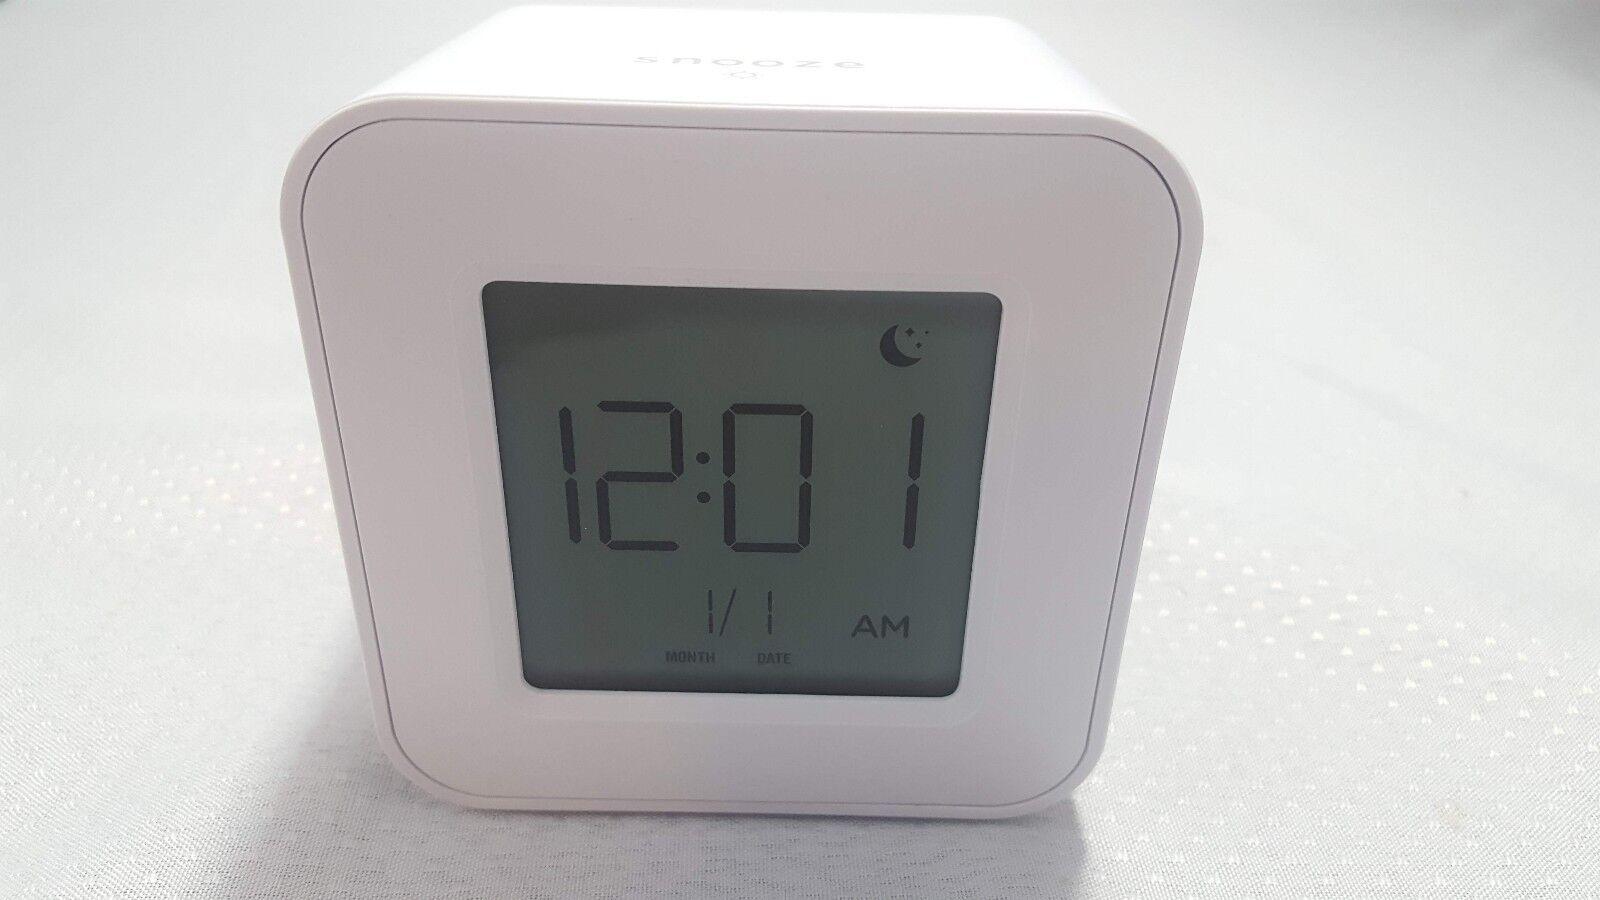 Capello Toc Clock Digital Alarm Clock Square Face White CA-5